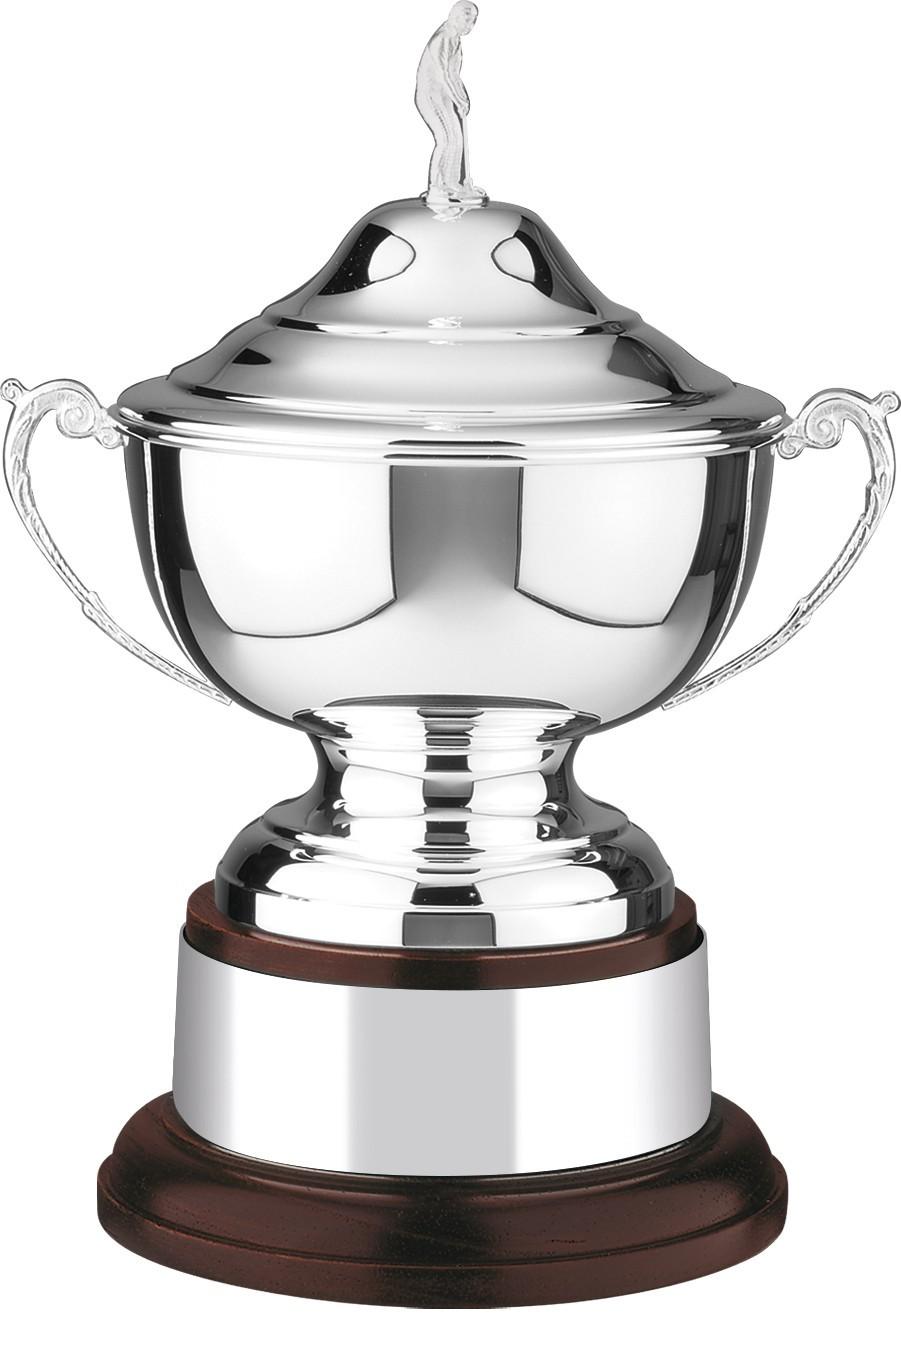 21cm Golf Challenge Bowl